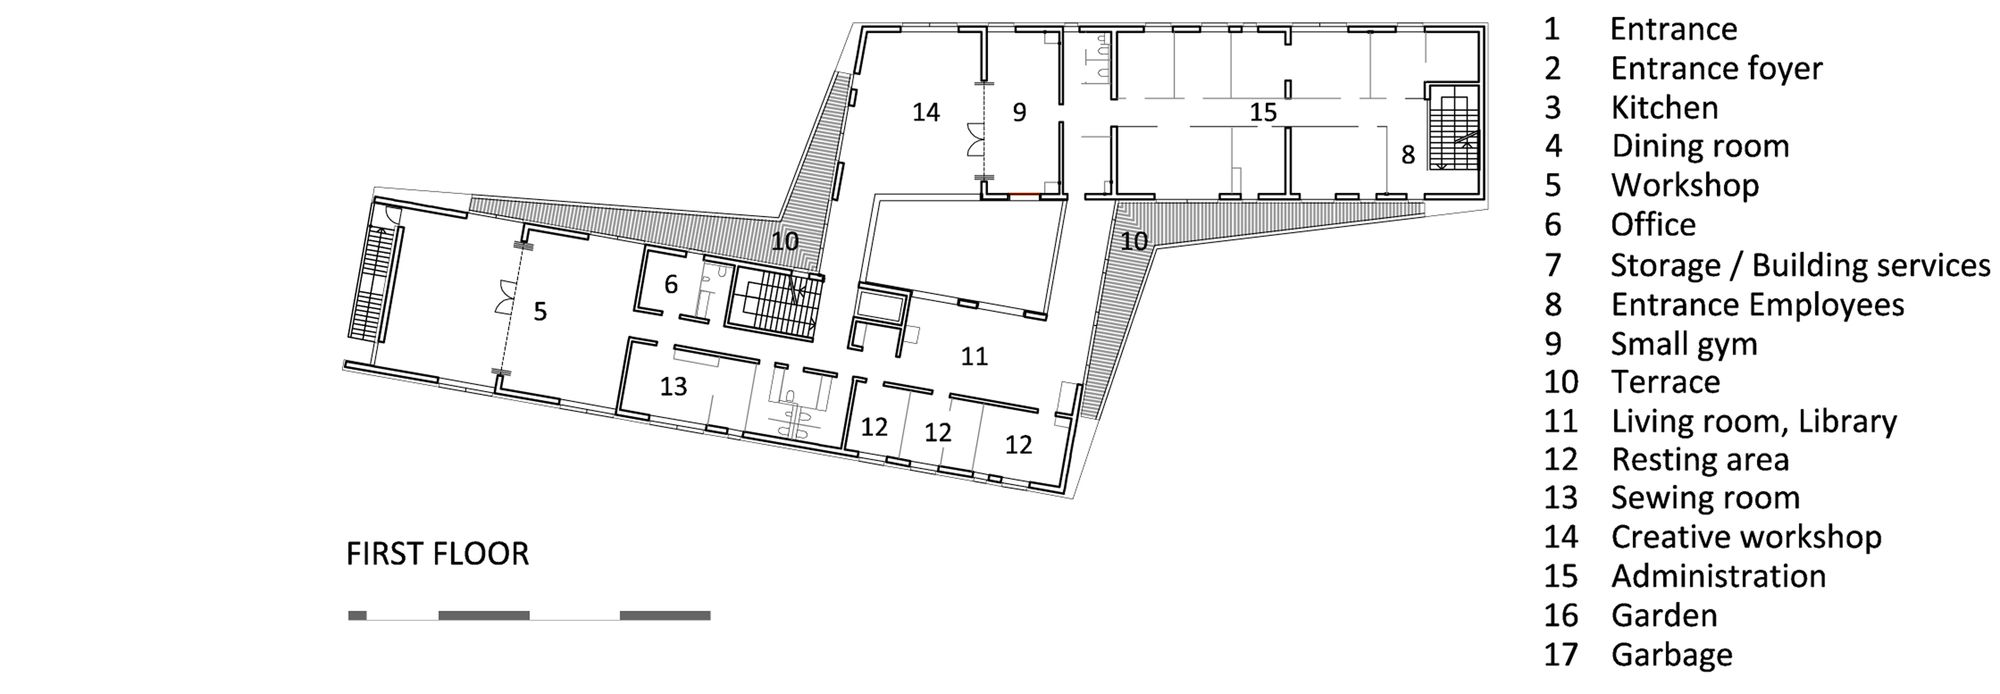 Occupational Activity Center INCE Mengeš / Jereb in Budja arhitekti